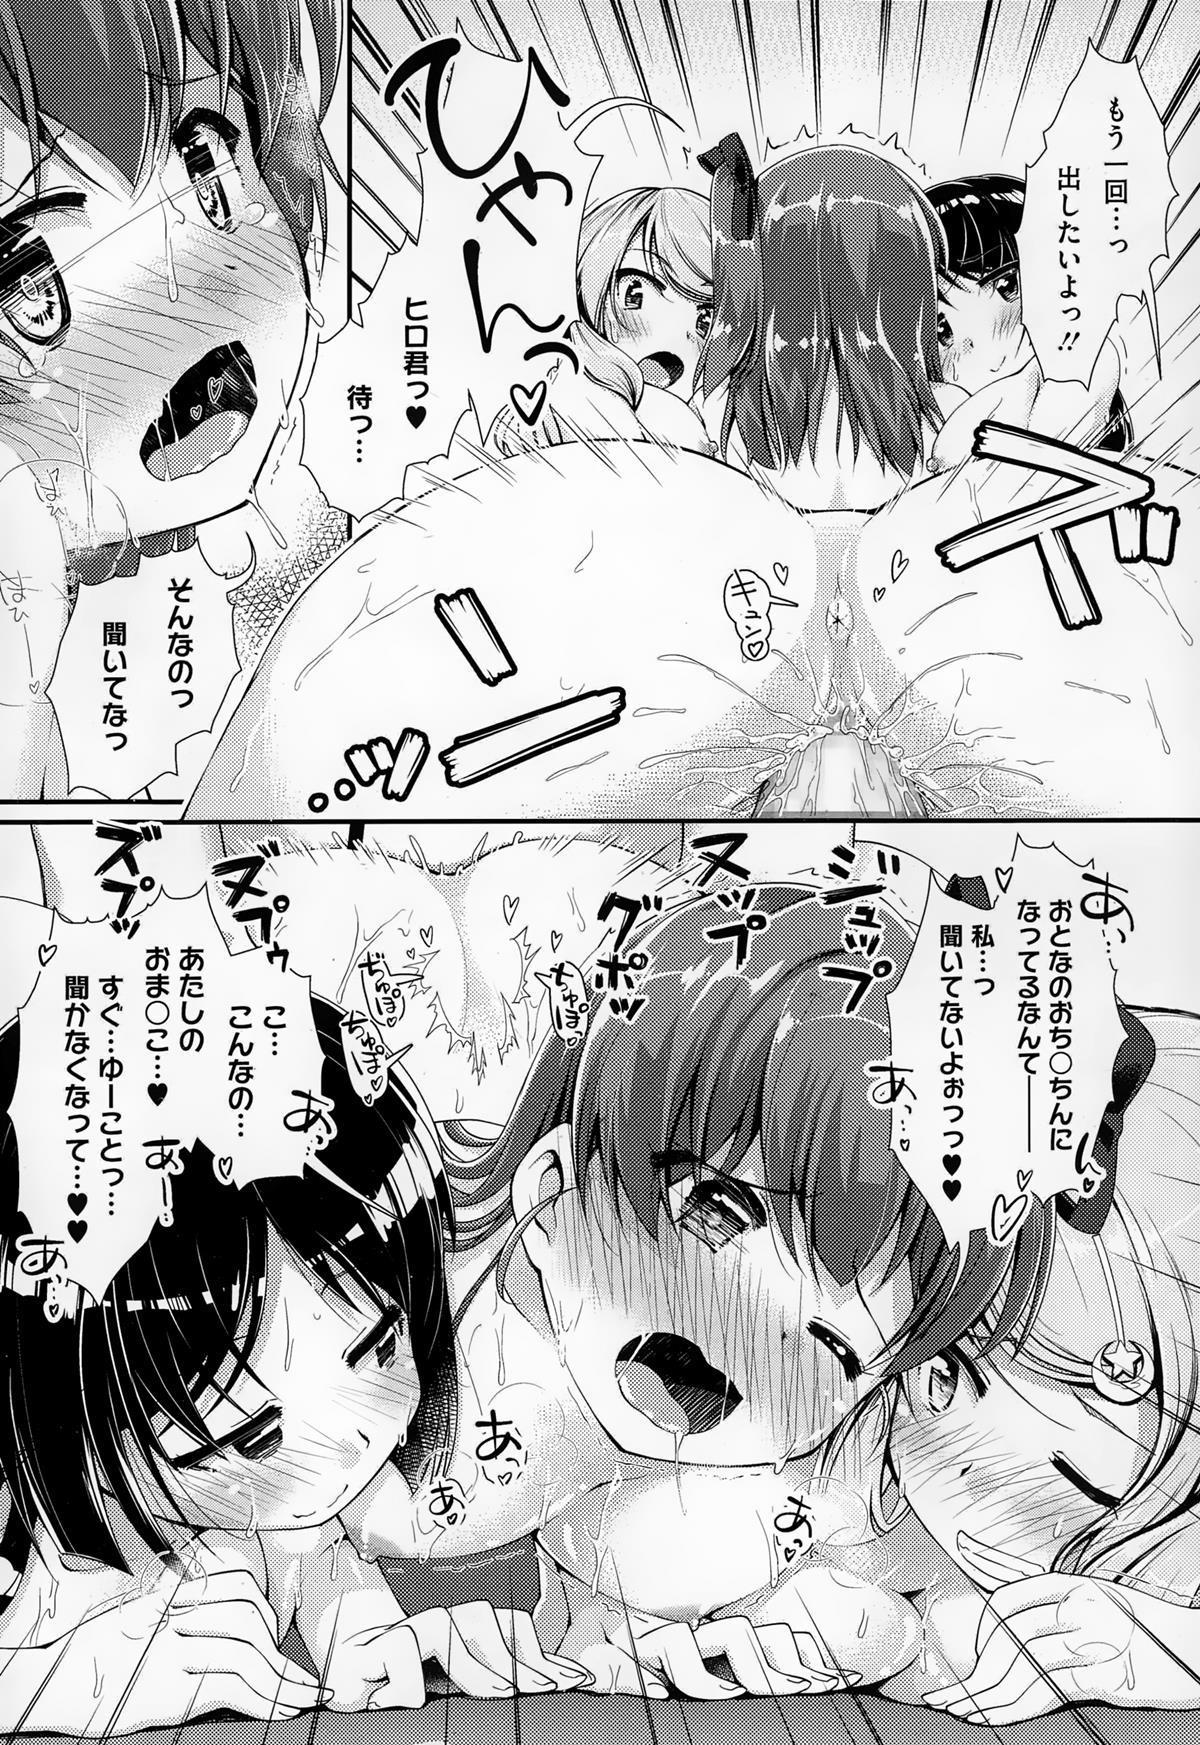 nariyukimakase no obbligato 17